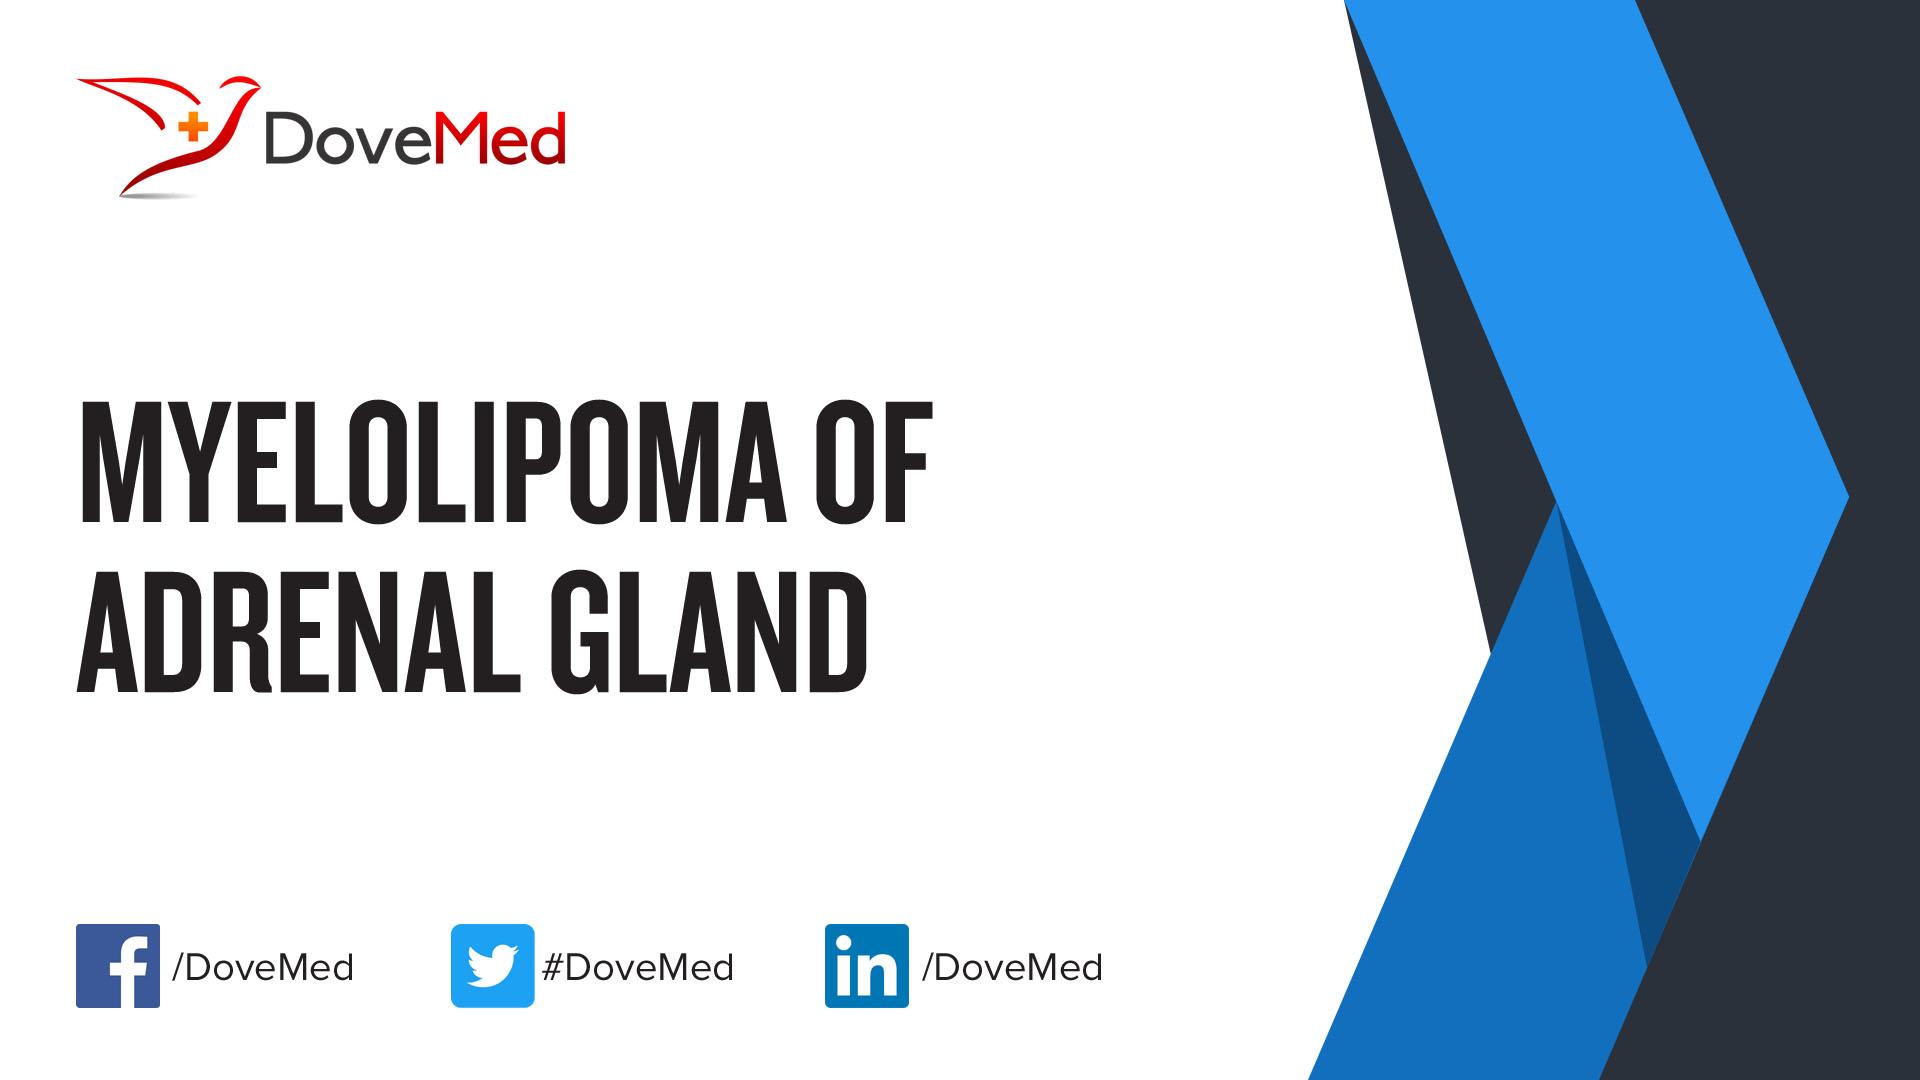 Myelolipoma Of Adrenal Gland